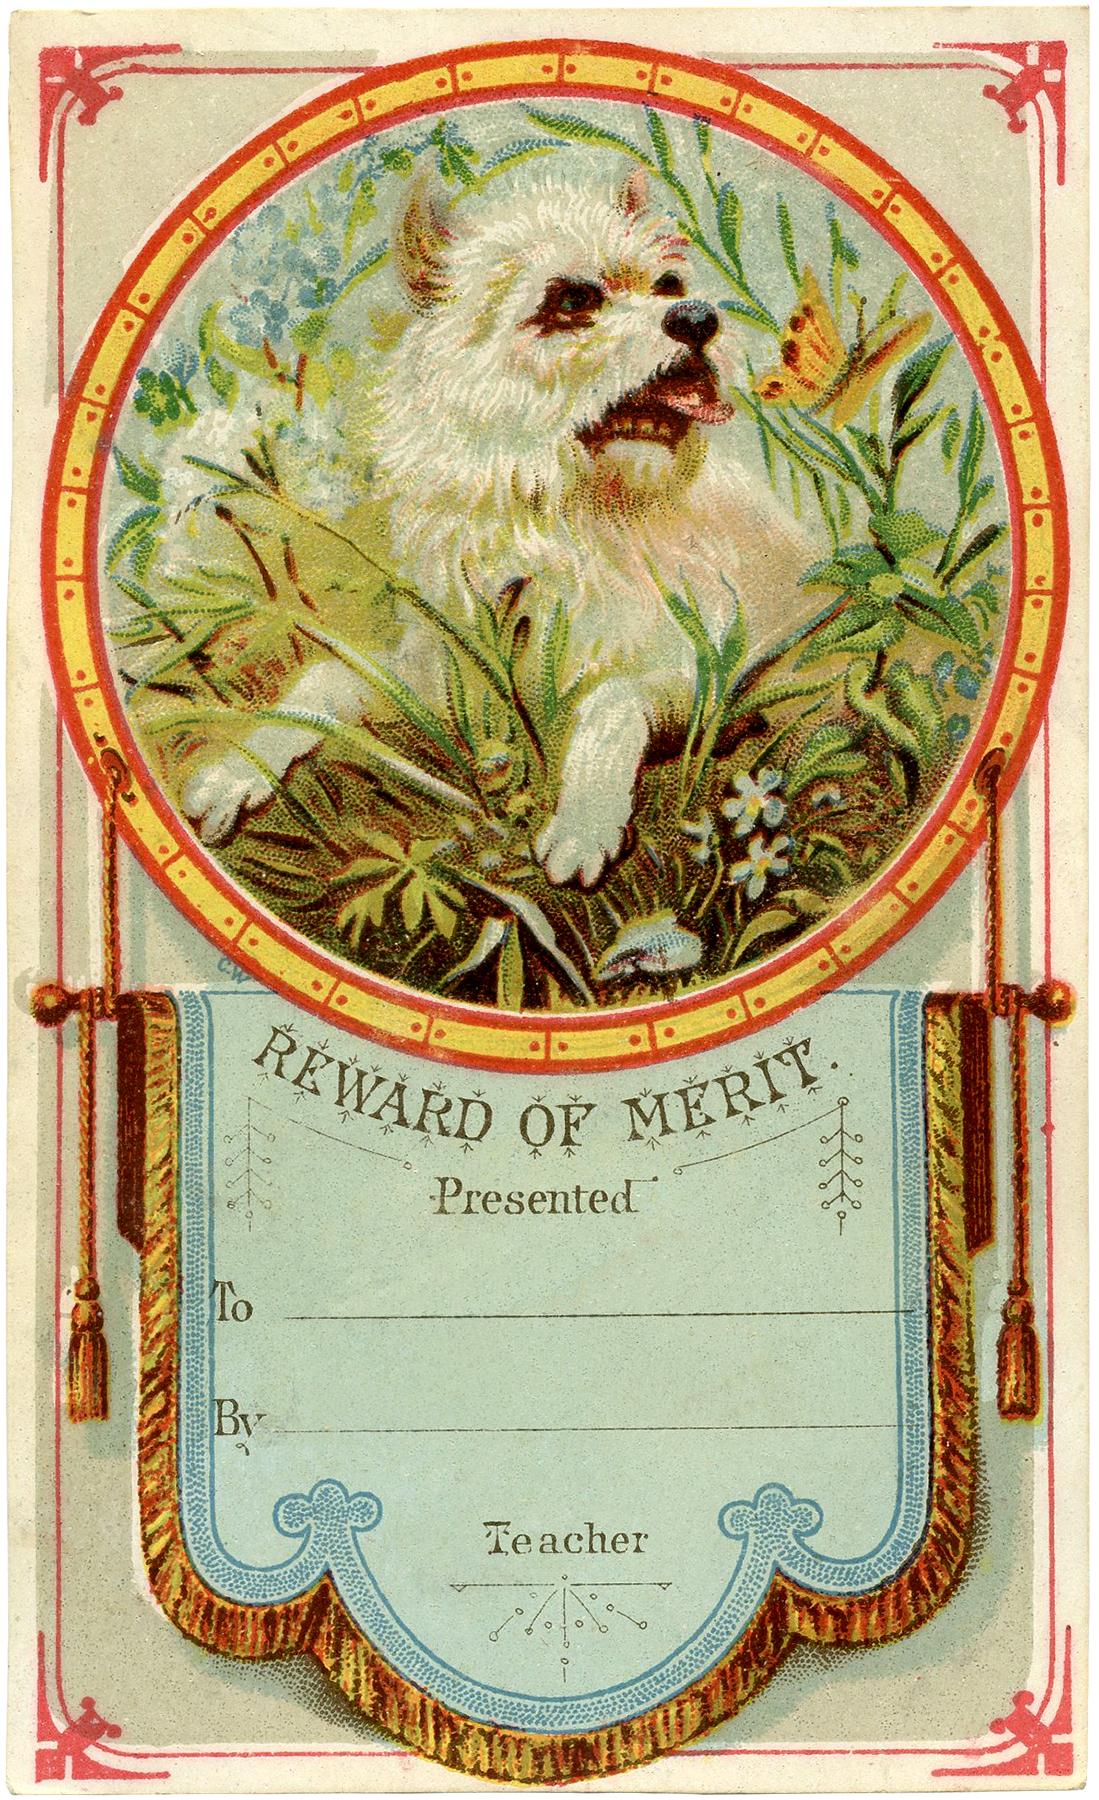 vintage reward of merit card - cute dog